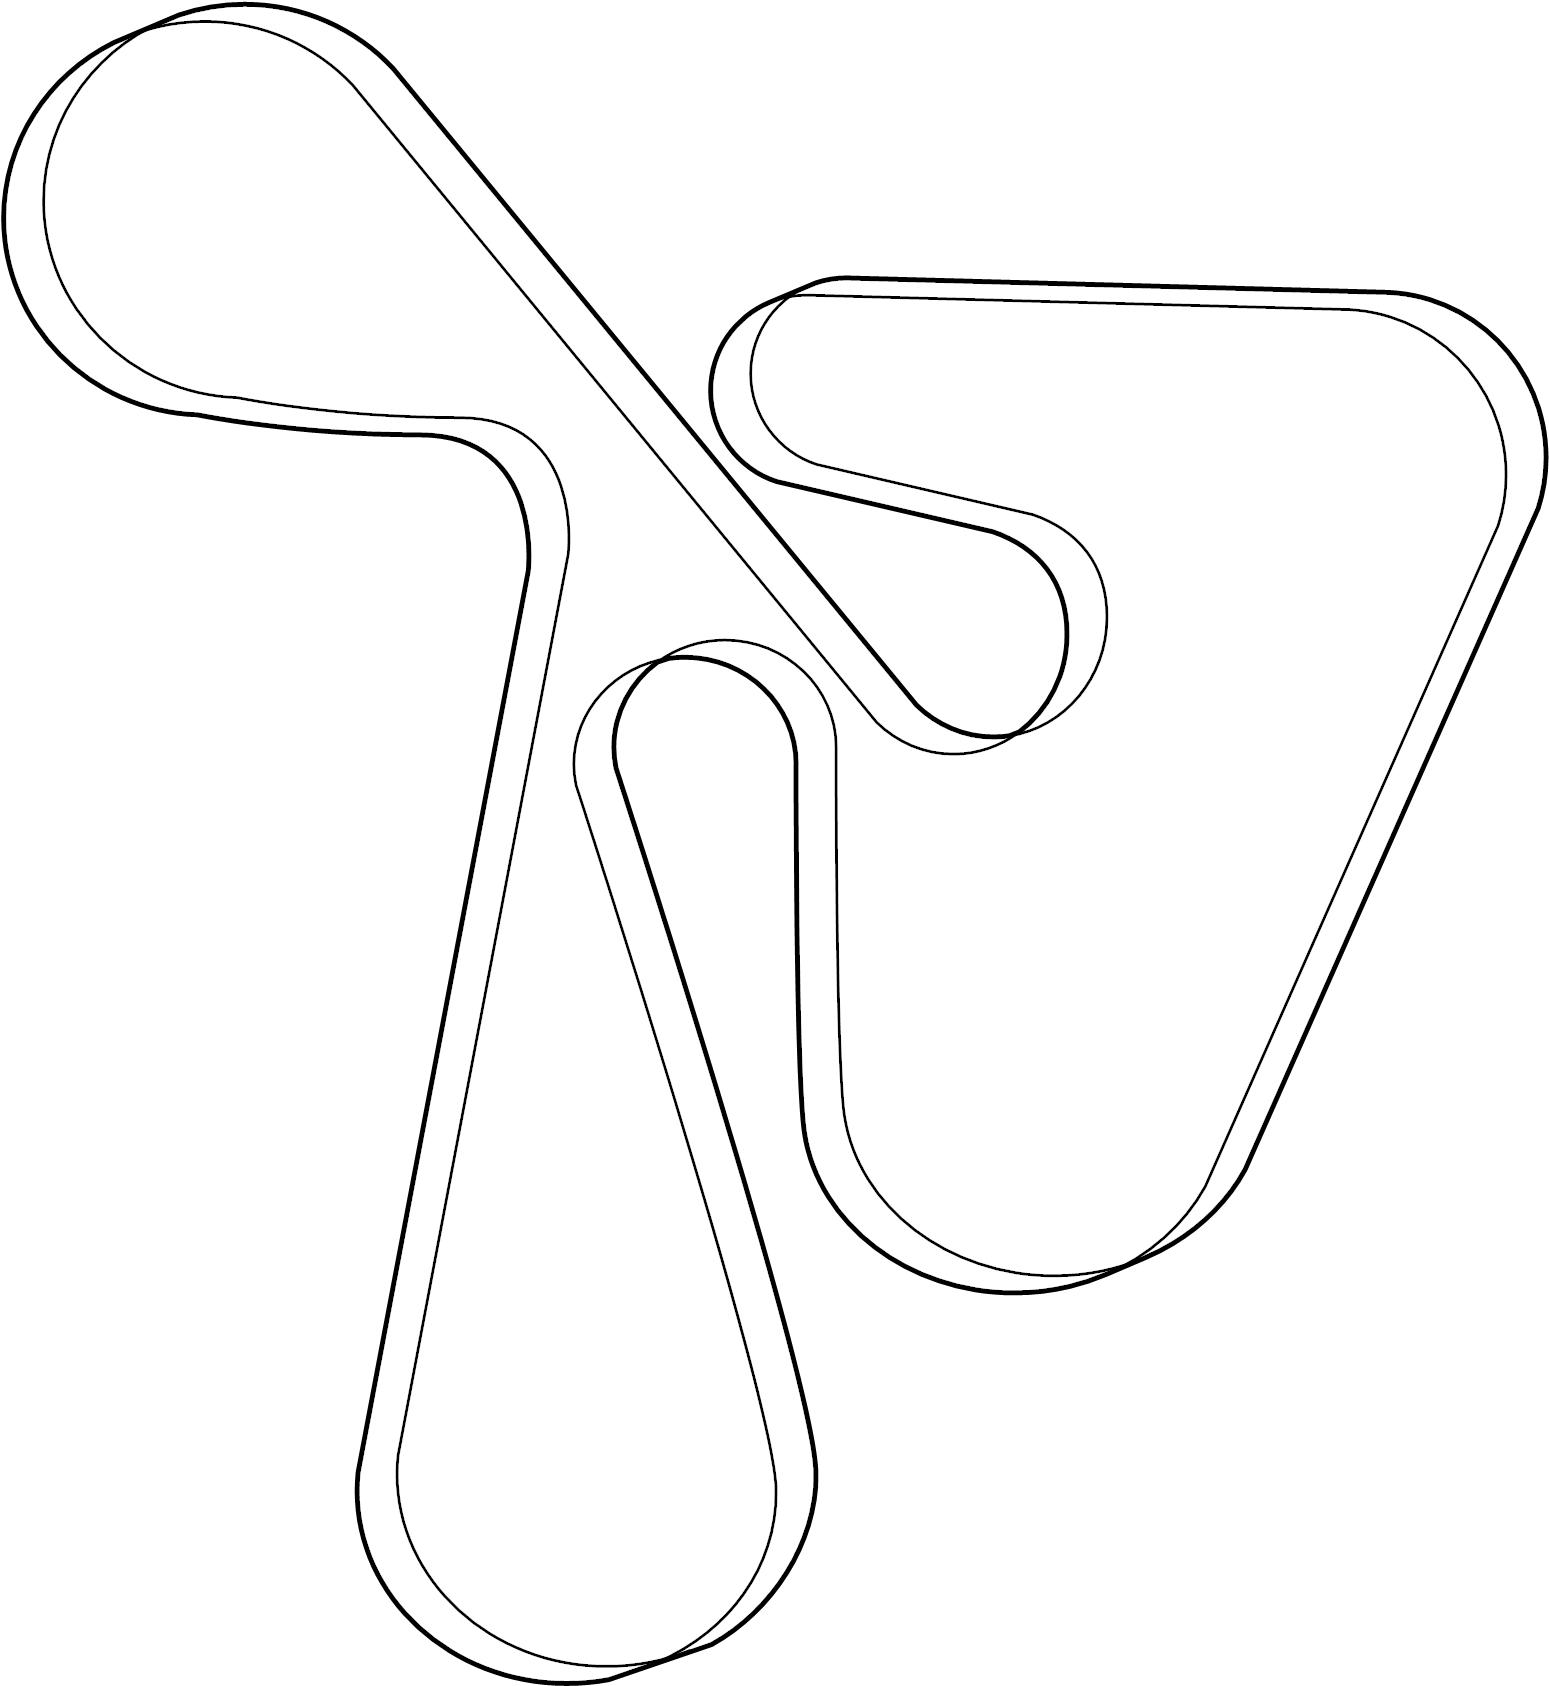 34 Dodge Caliber Serpentine Belt Diagram